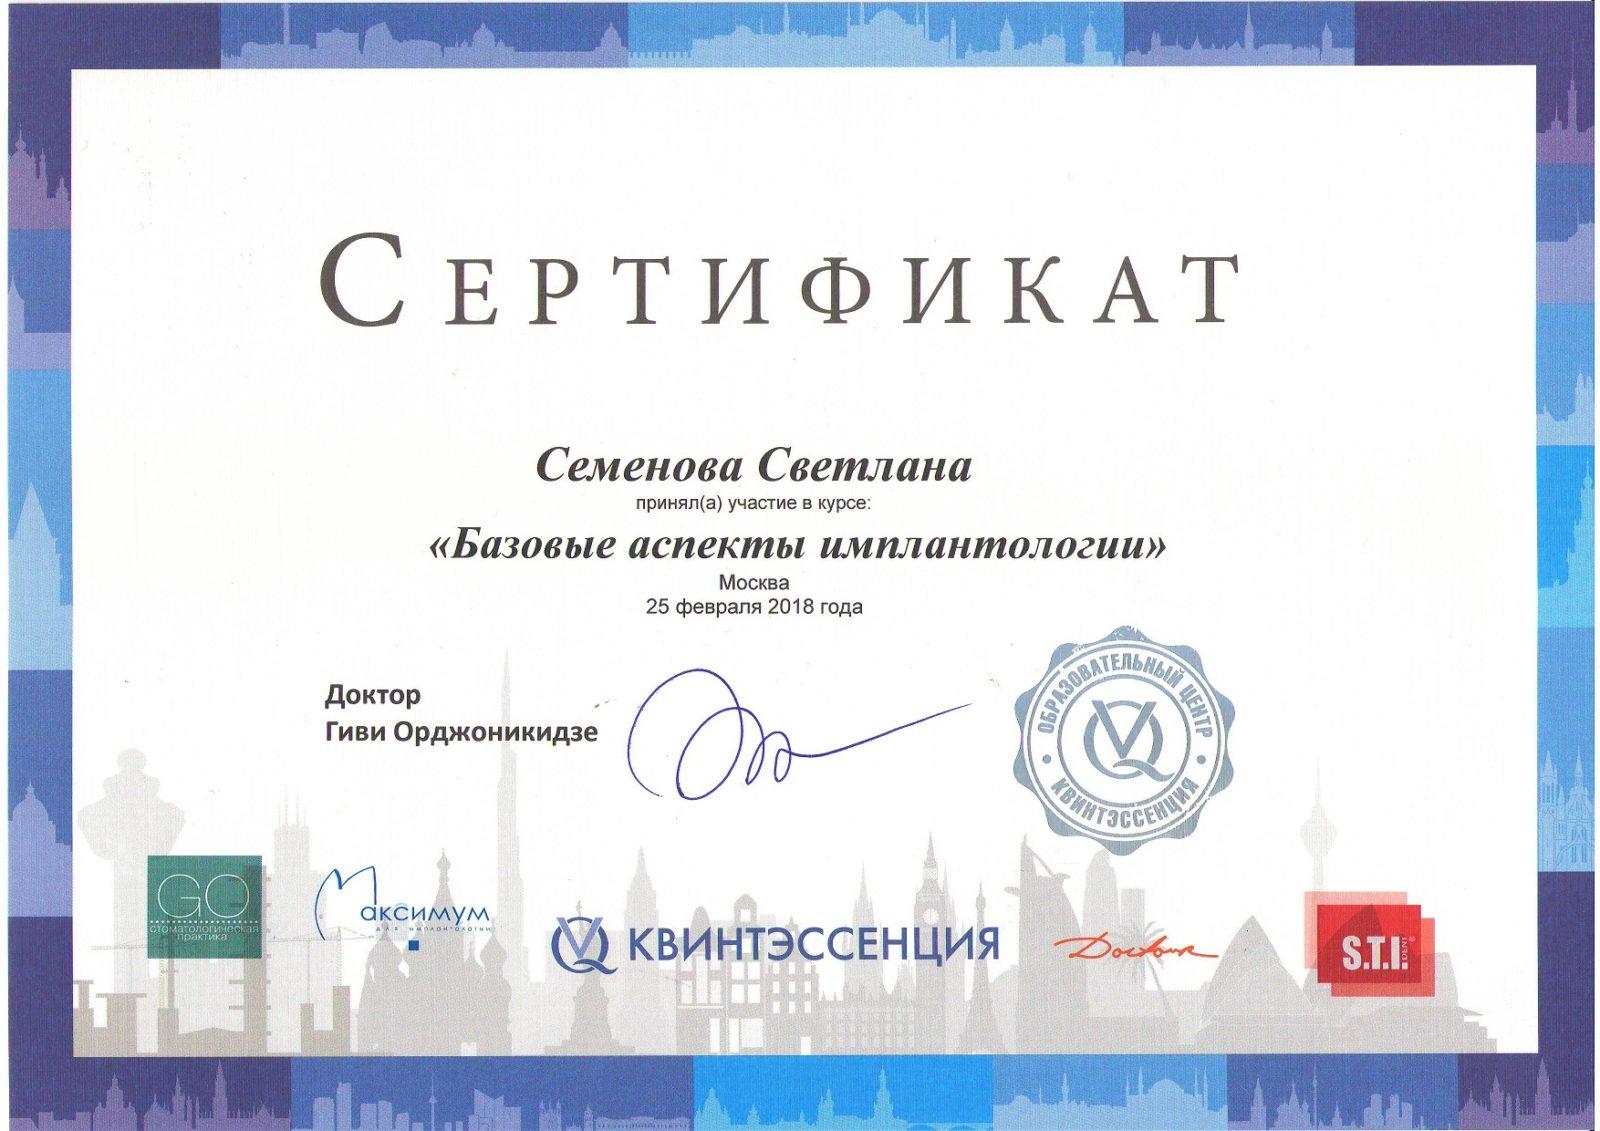 https://oris-vidnoe.ru/wp-content/uploads/2021/06/semenova3.jpg